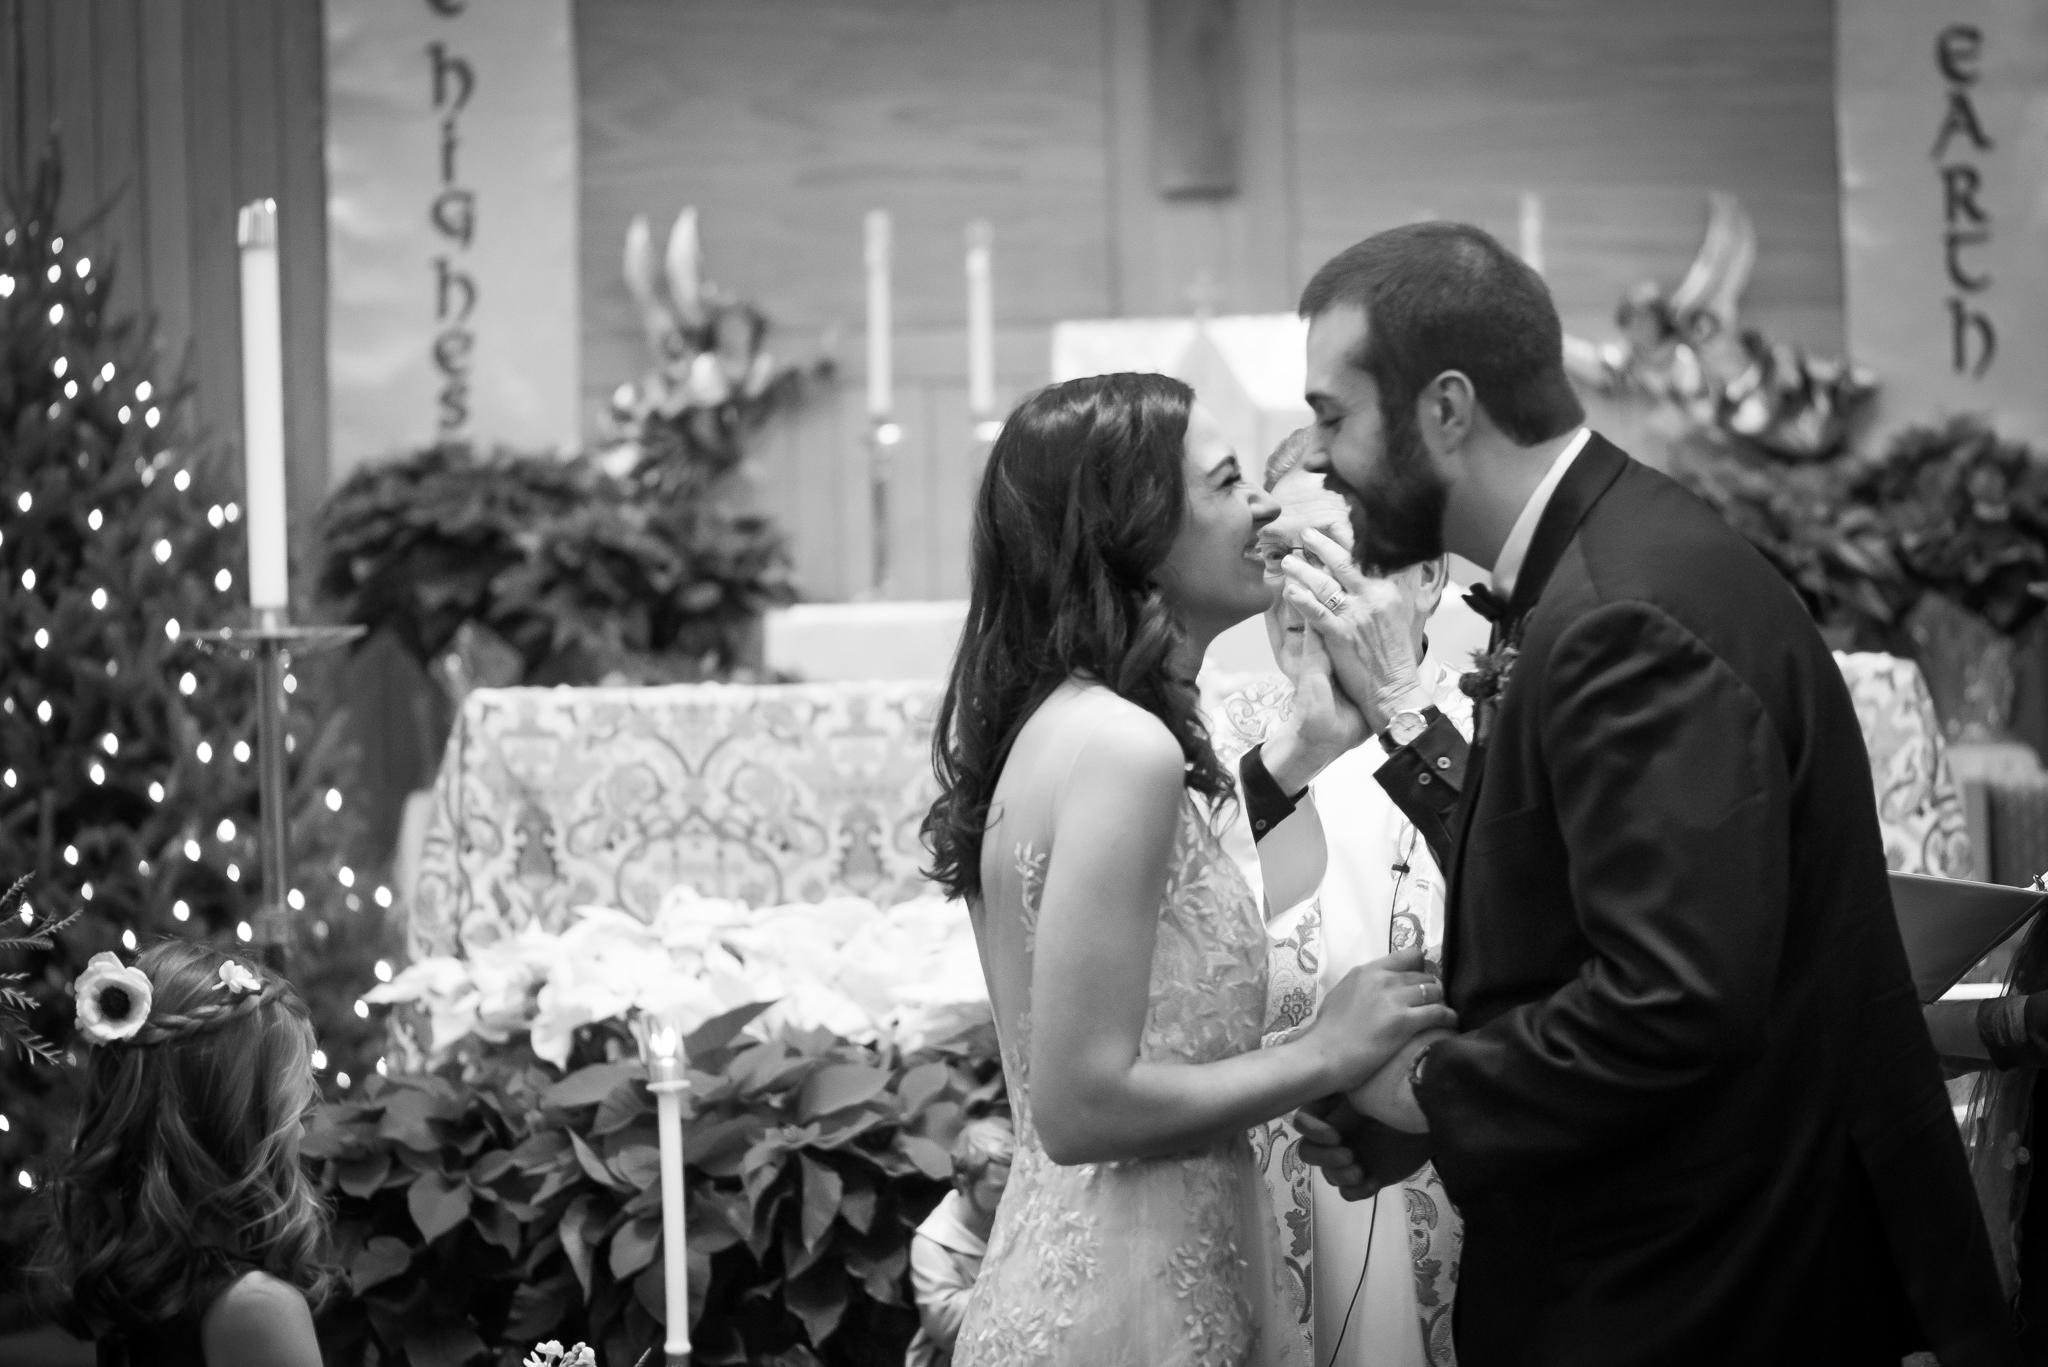 merrimon-wynne-wedding-photography-033.jpg